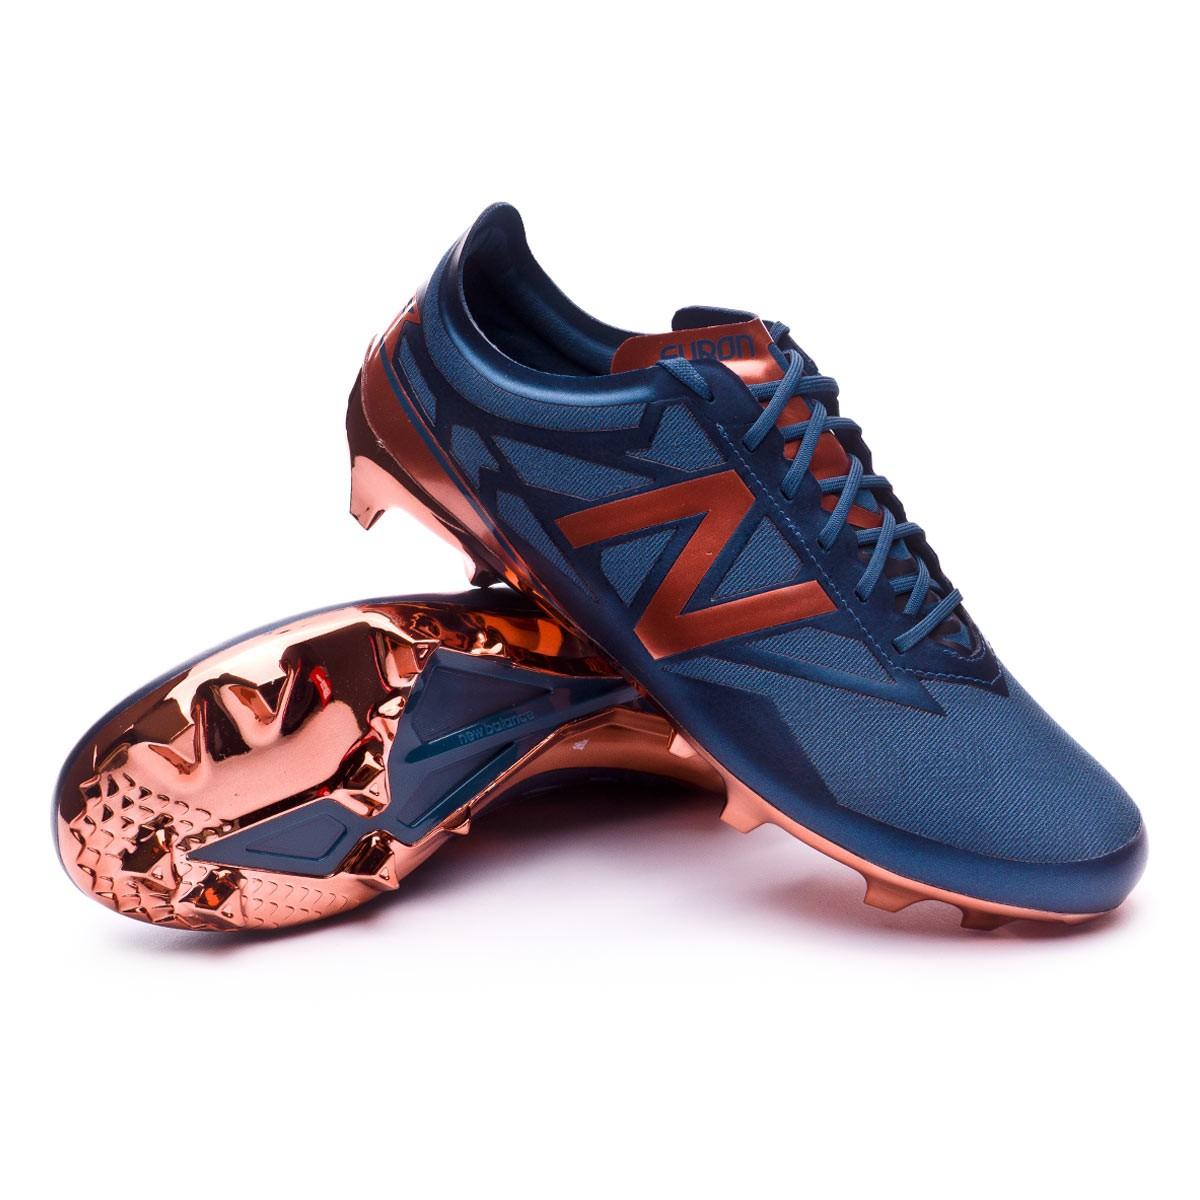 496f2a9a5 Football Boots New Balance Furon Pro Limited Edition Petroleum ...